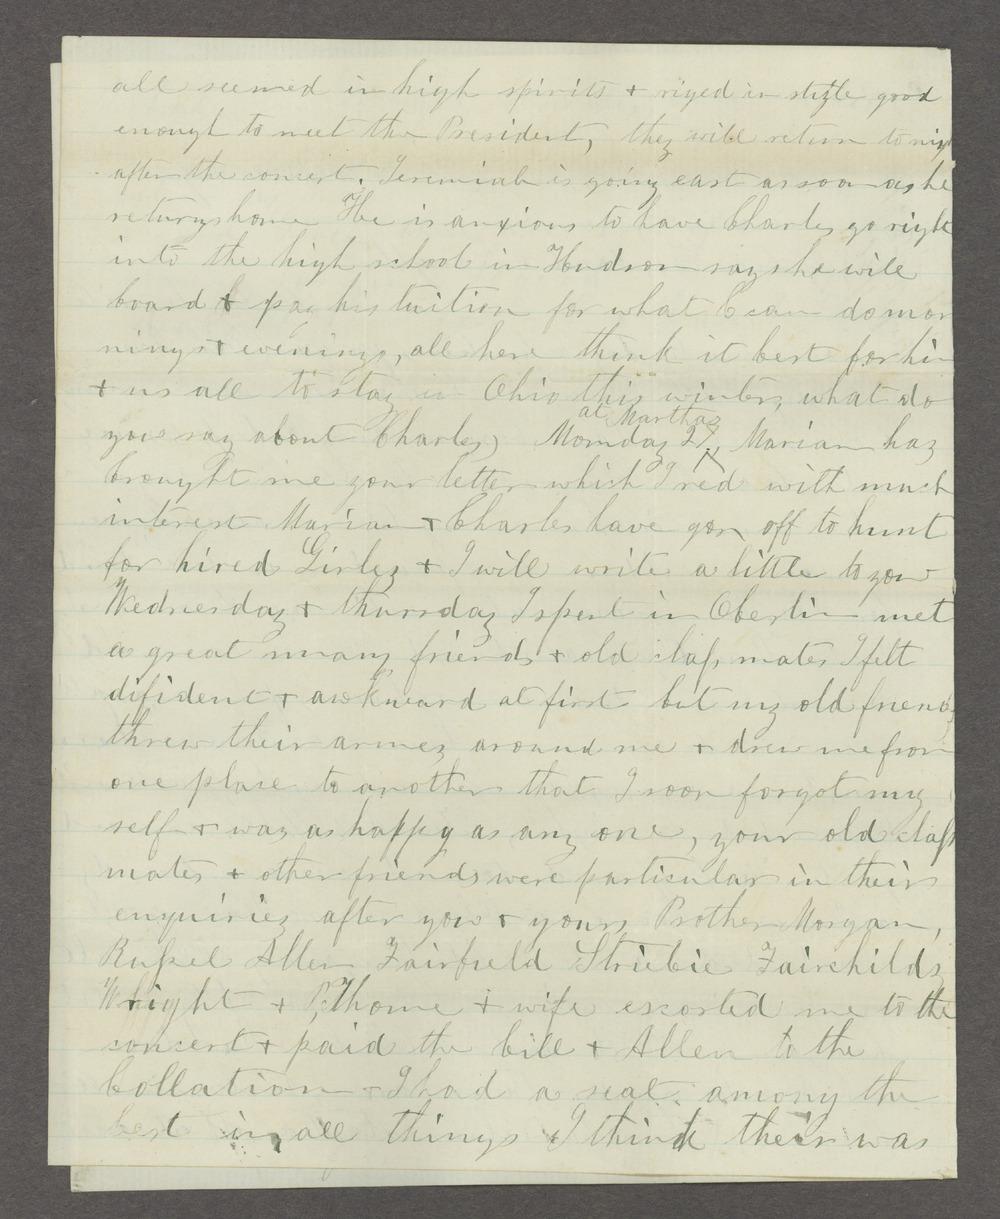 Correspondence between Samuel Lyle Adair, Florella Brown Adair, and their children - 6